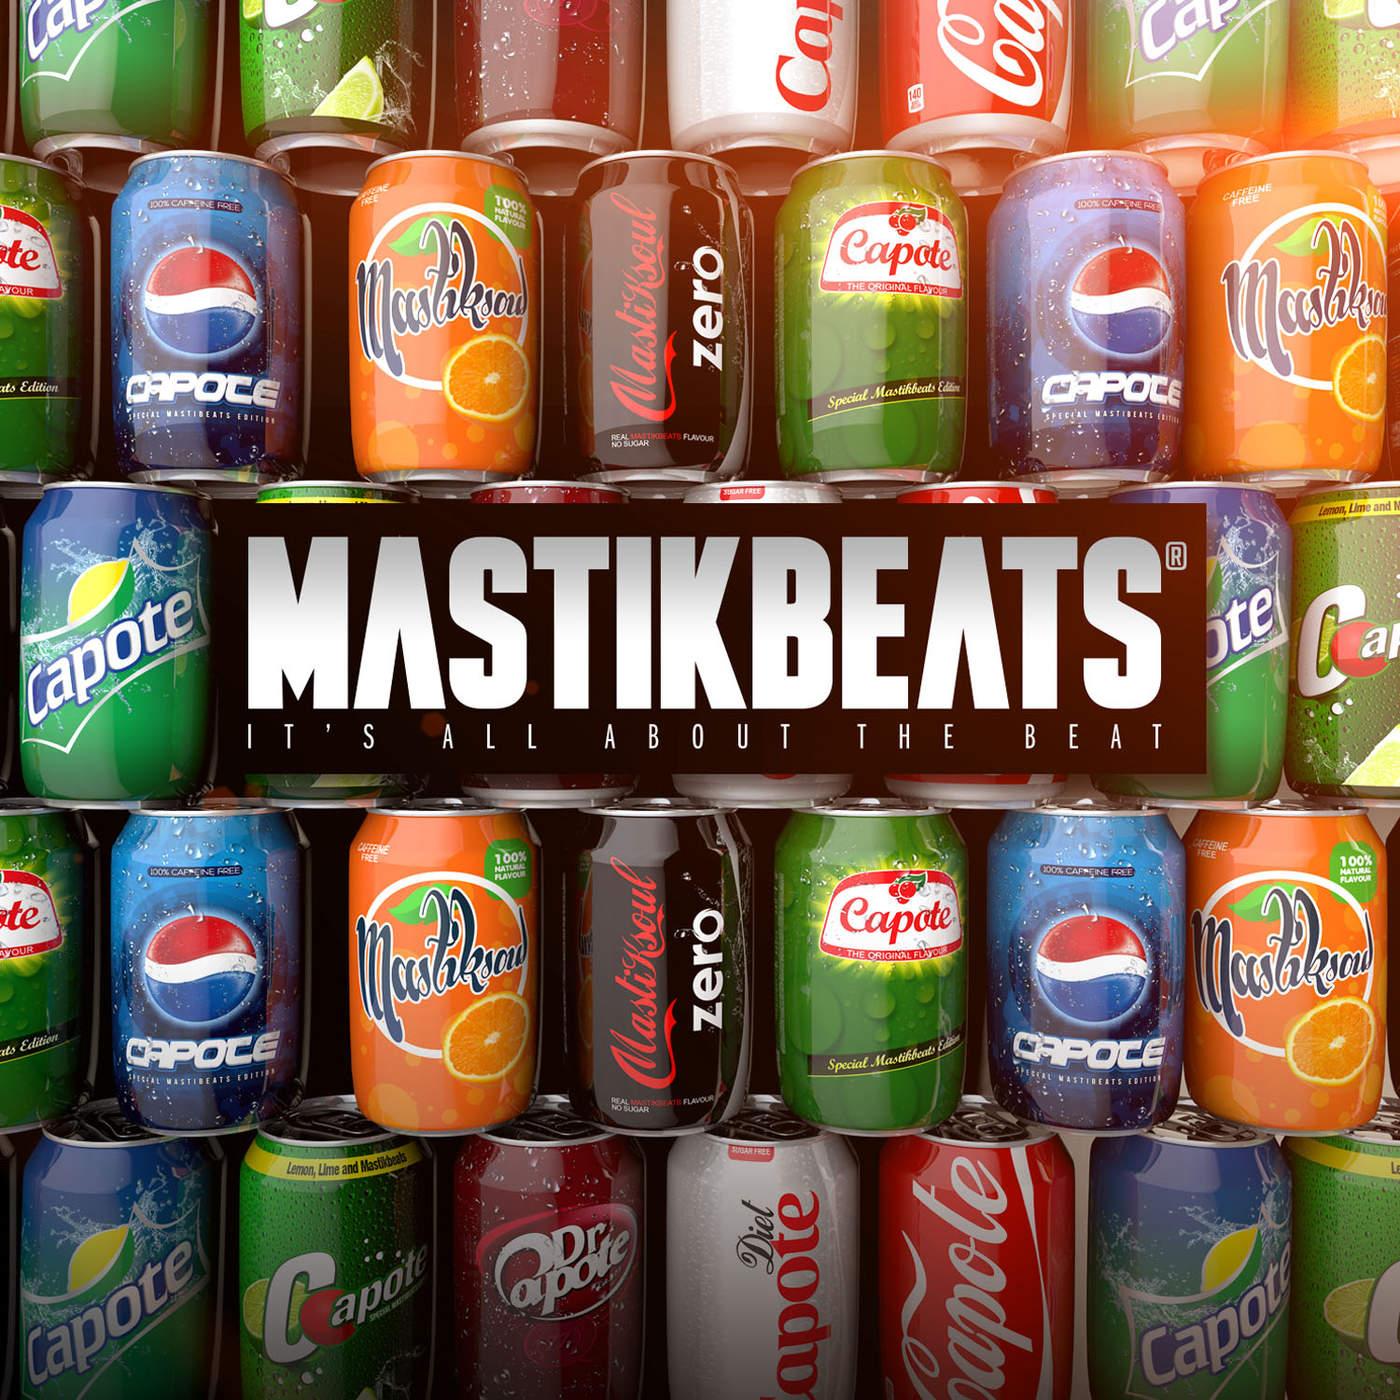 Mastikbeats.jpg